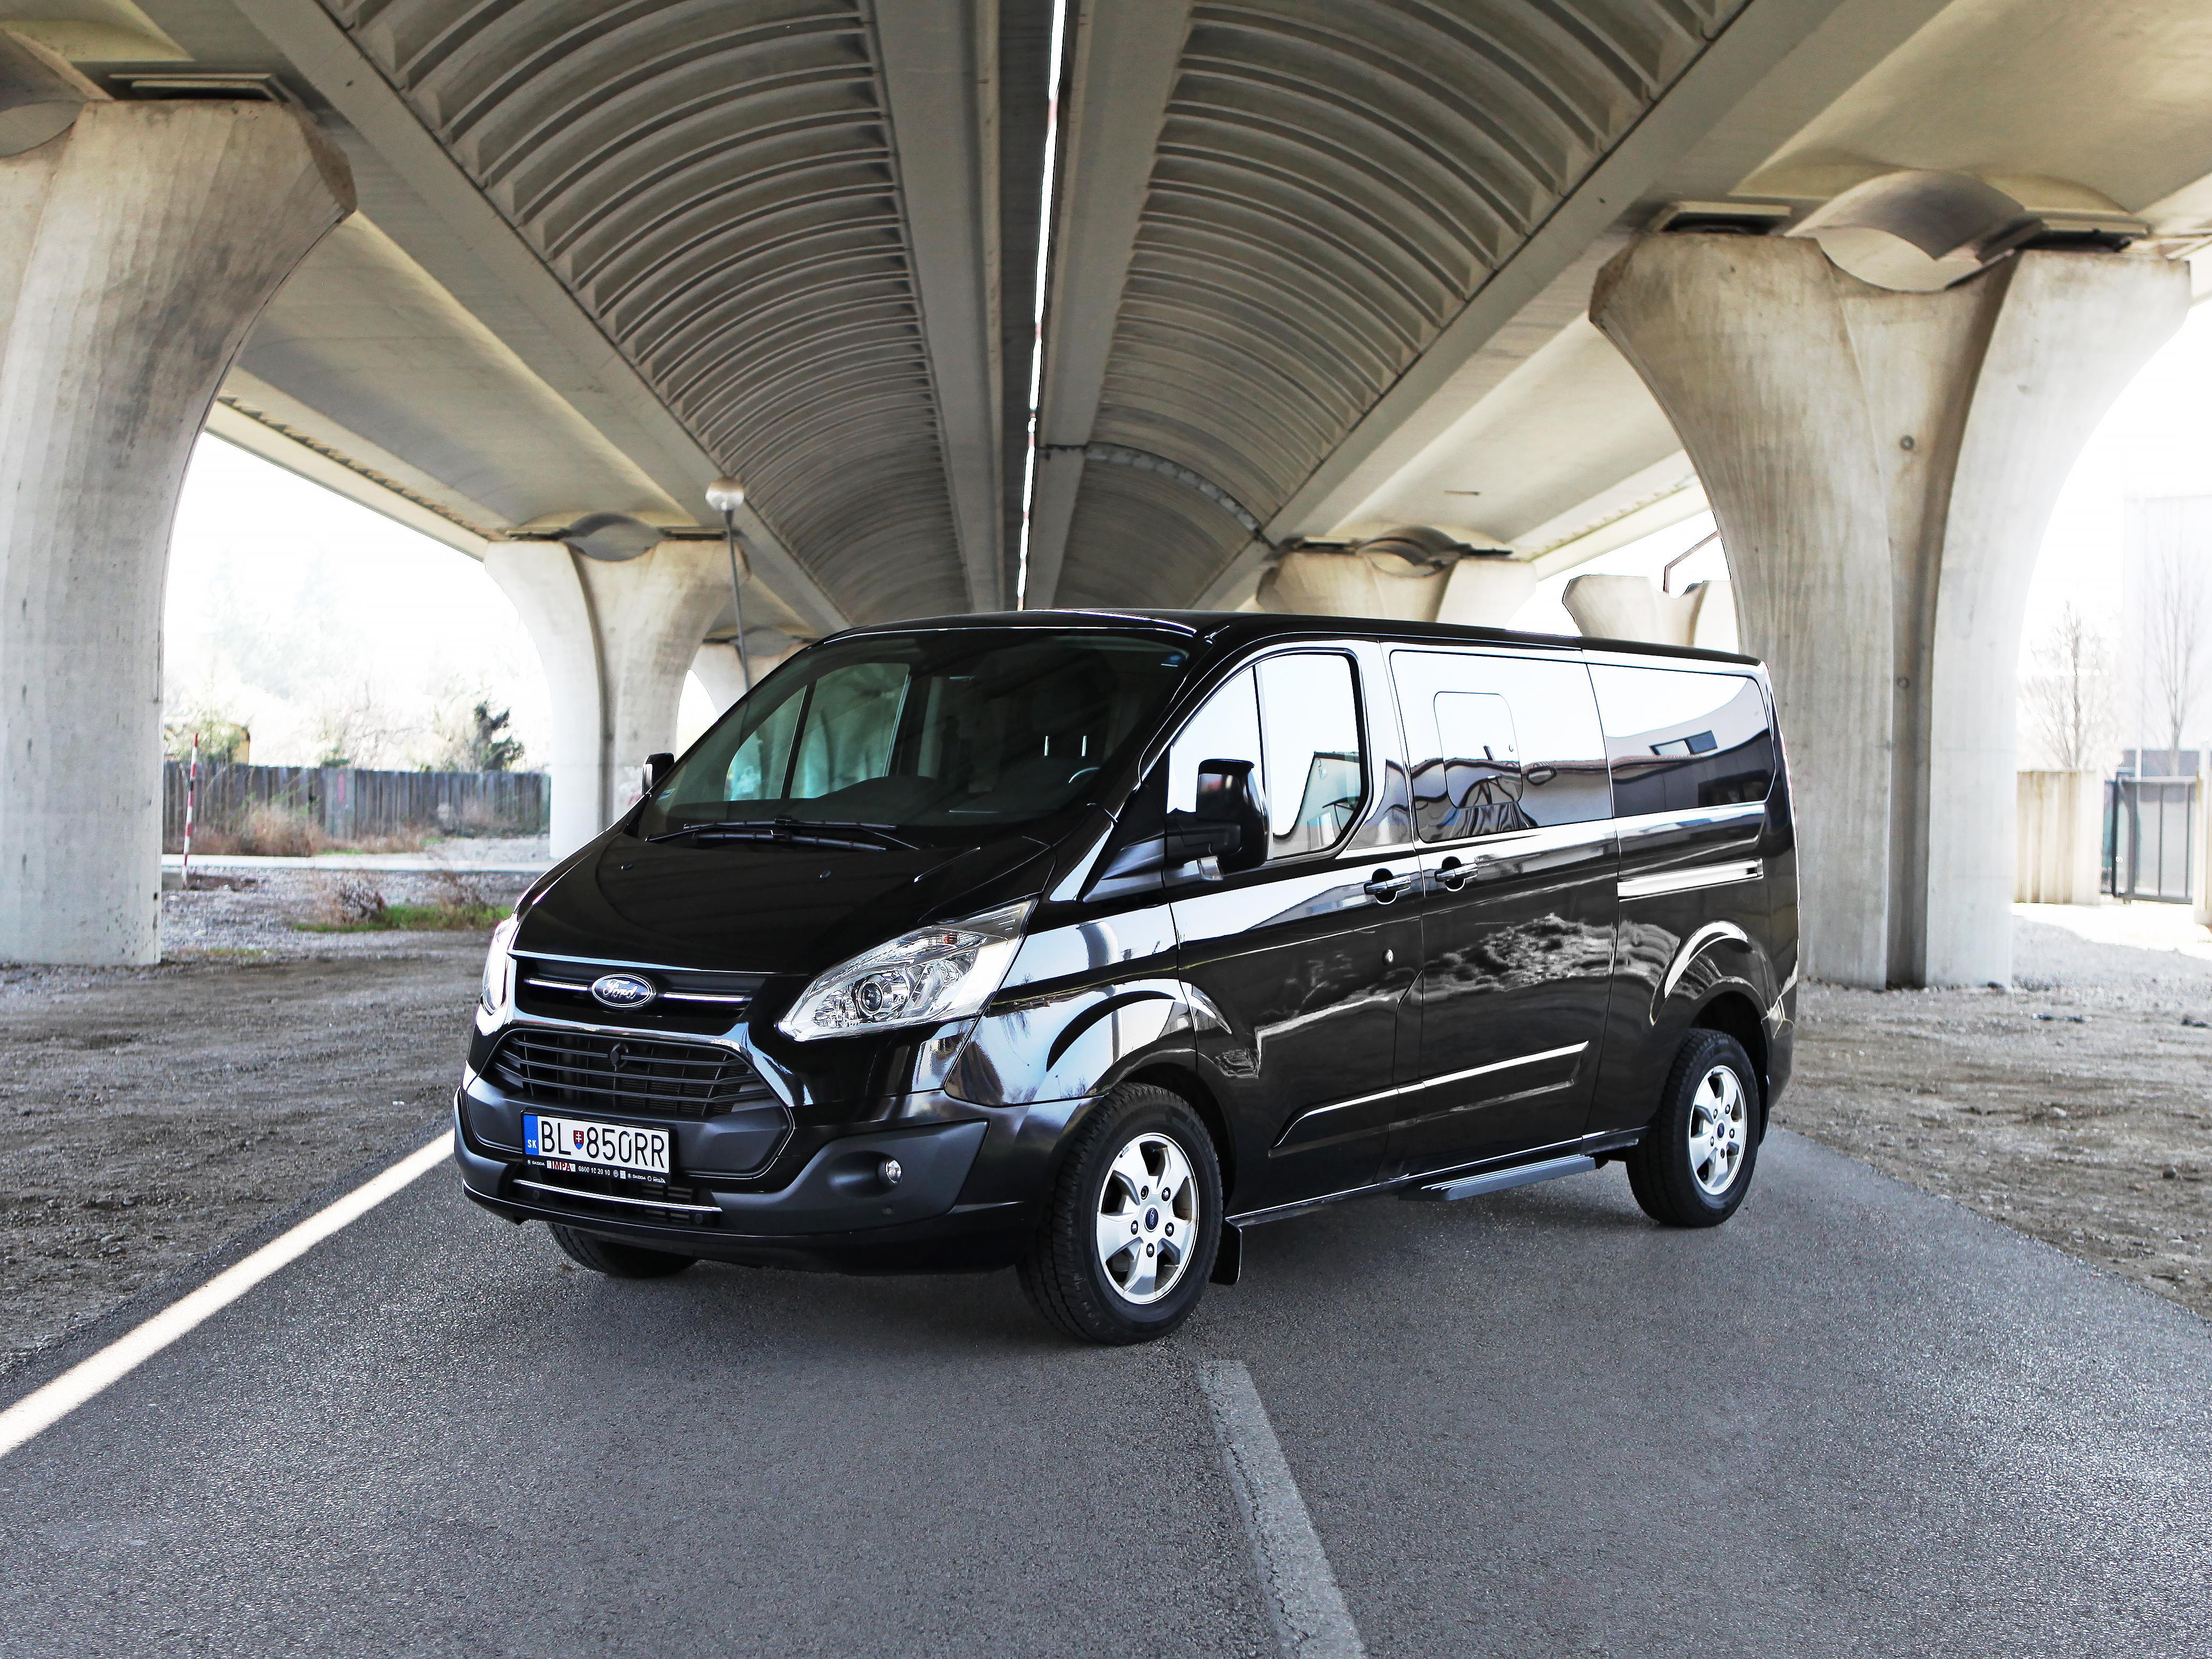 Ford Tourneo EcoBlue TDCi